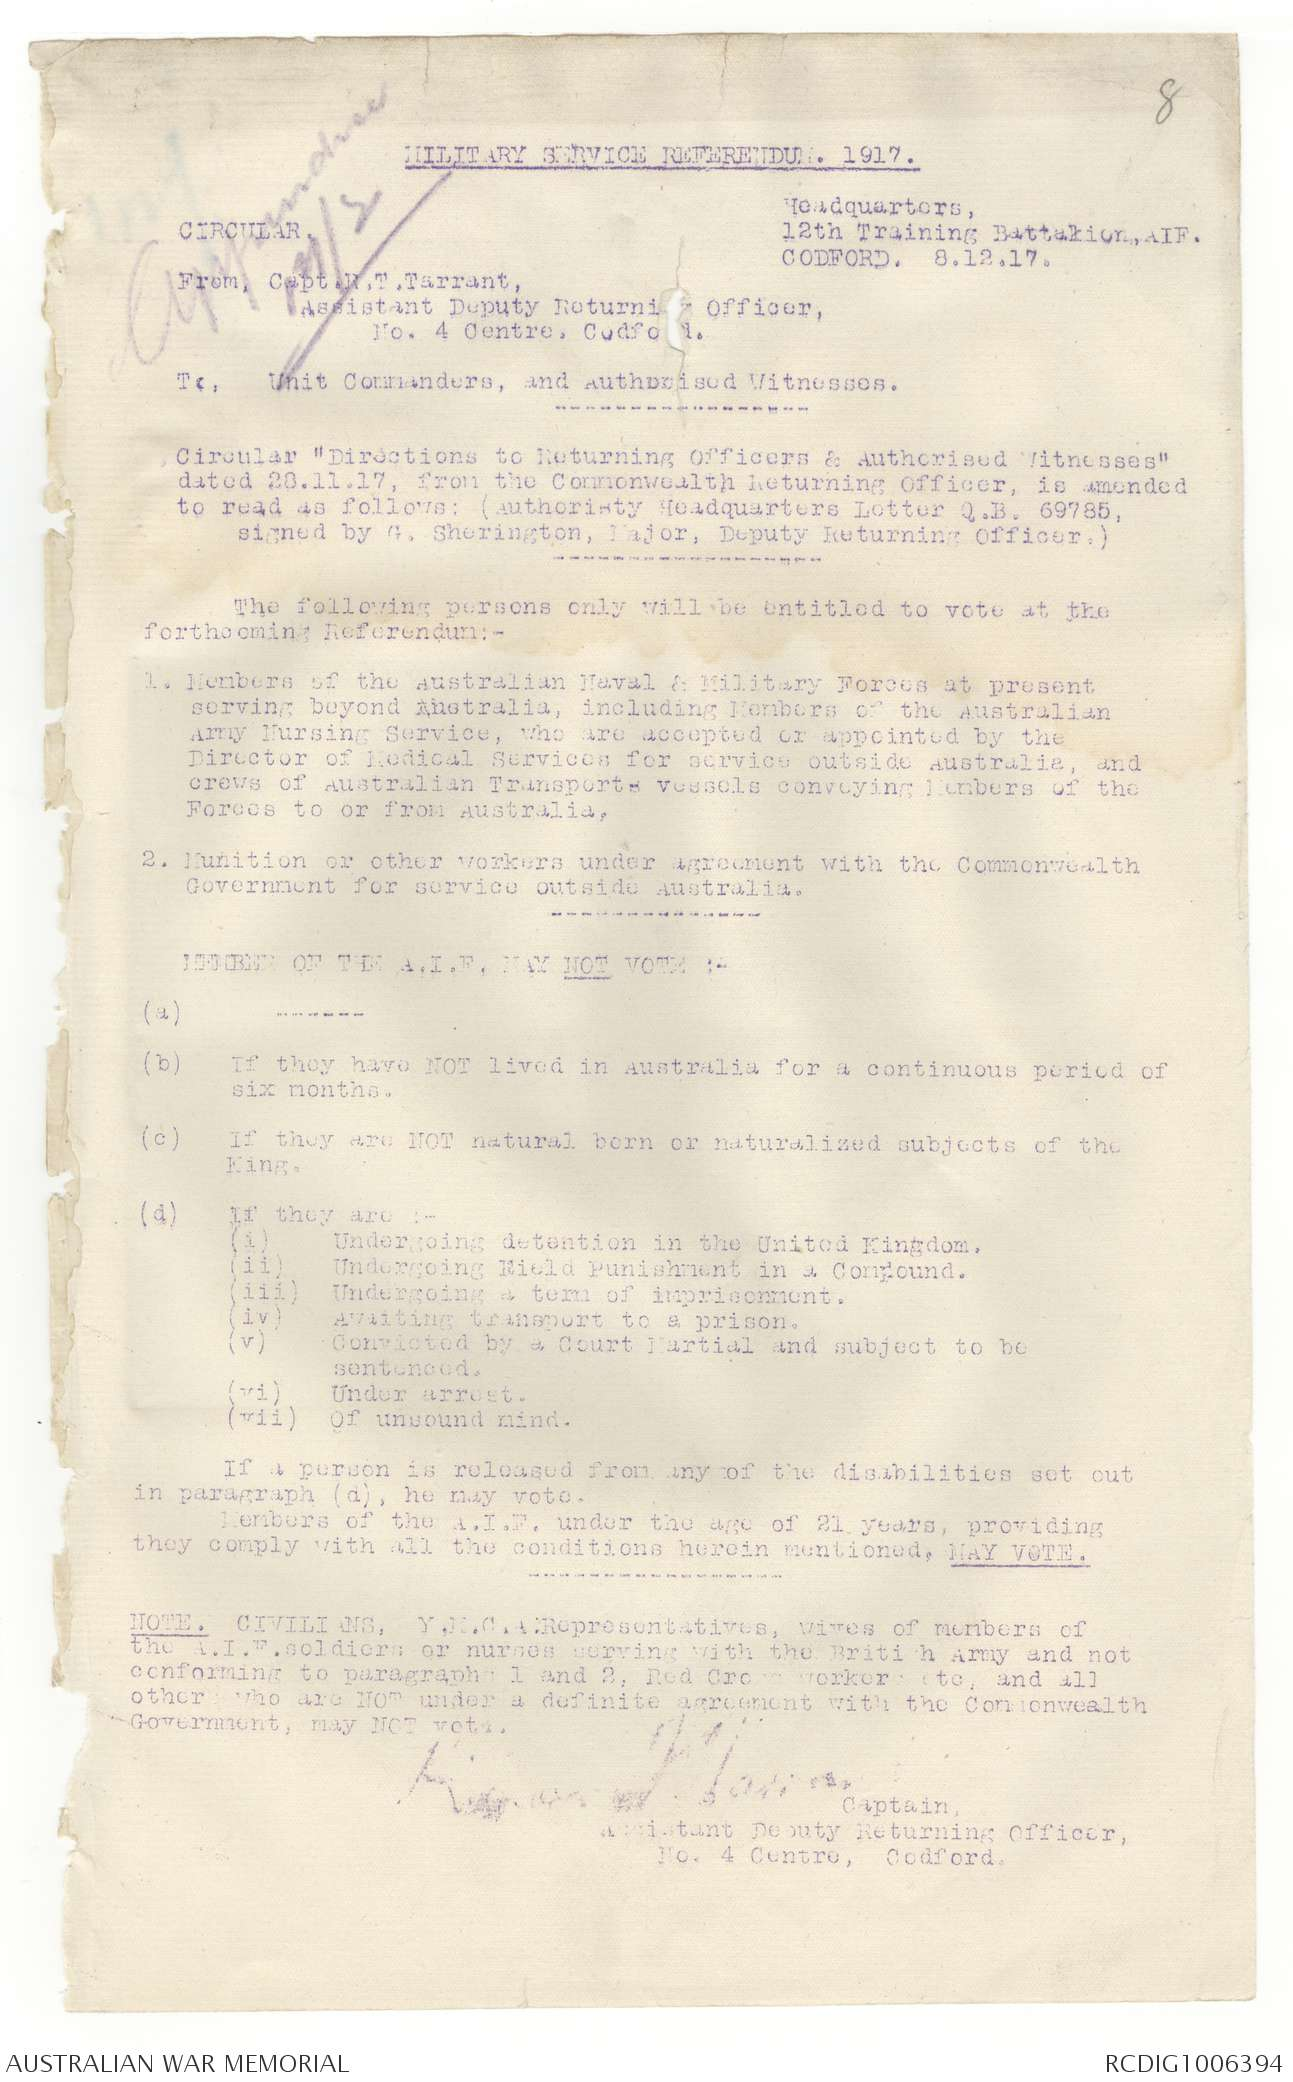 AWM4 23/92/5 - December 1917 | The Australian War Memorial